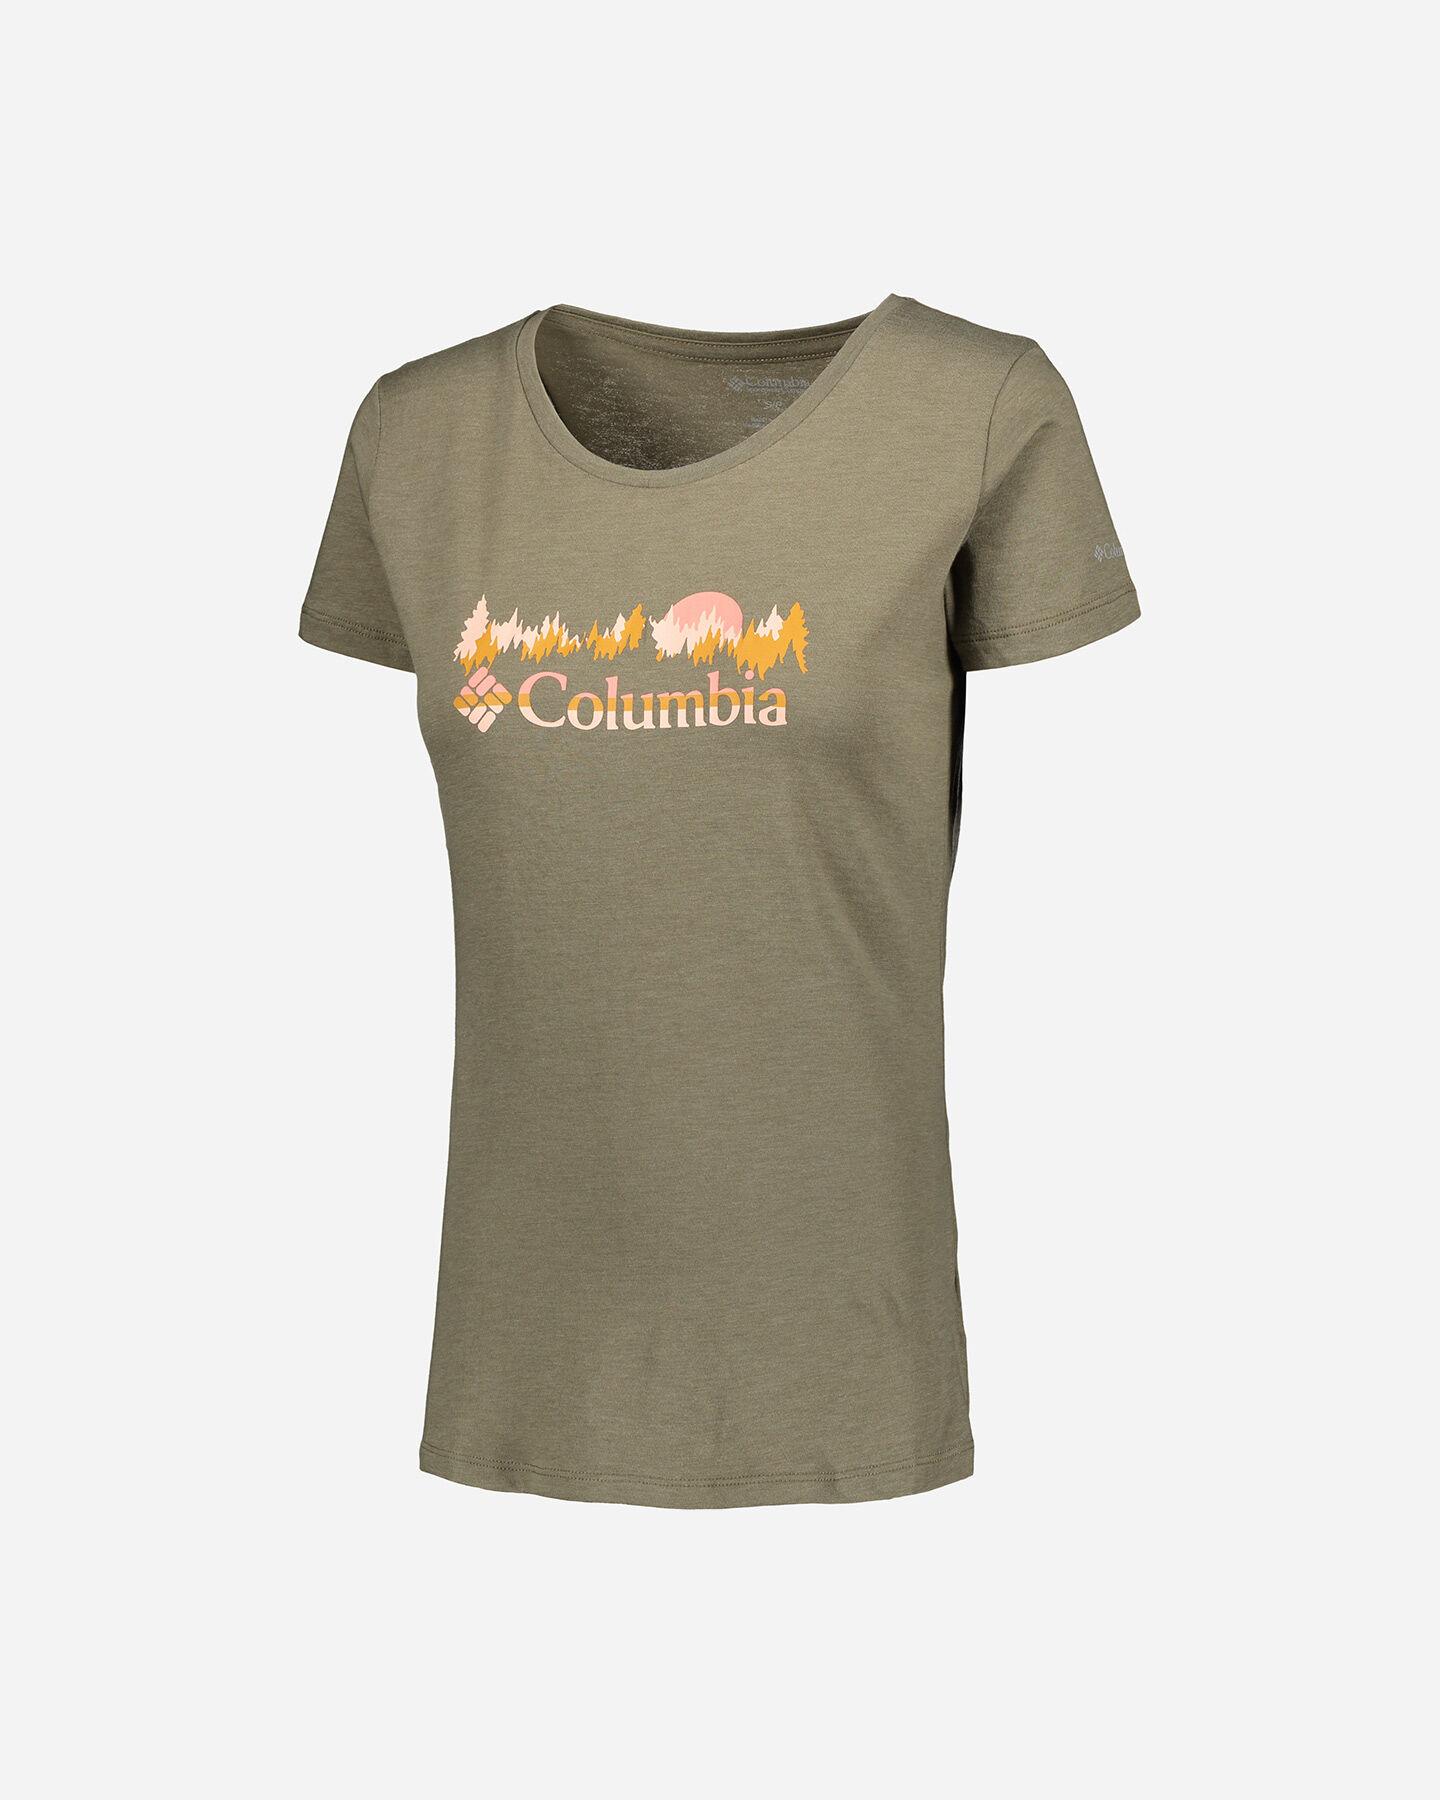 T-Shirt COLUMBIA DAISY GRAPHIC W S5292071 scatto 0